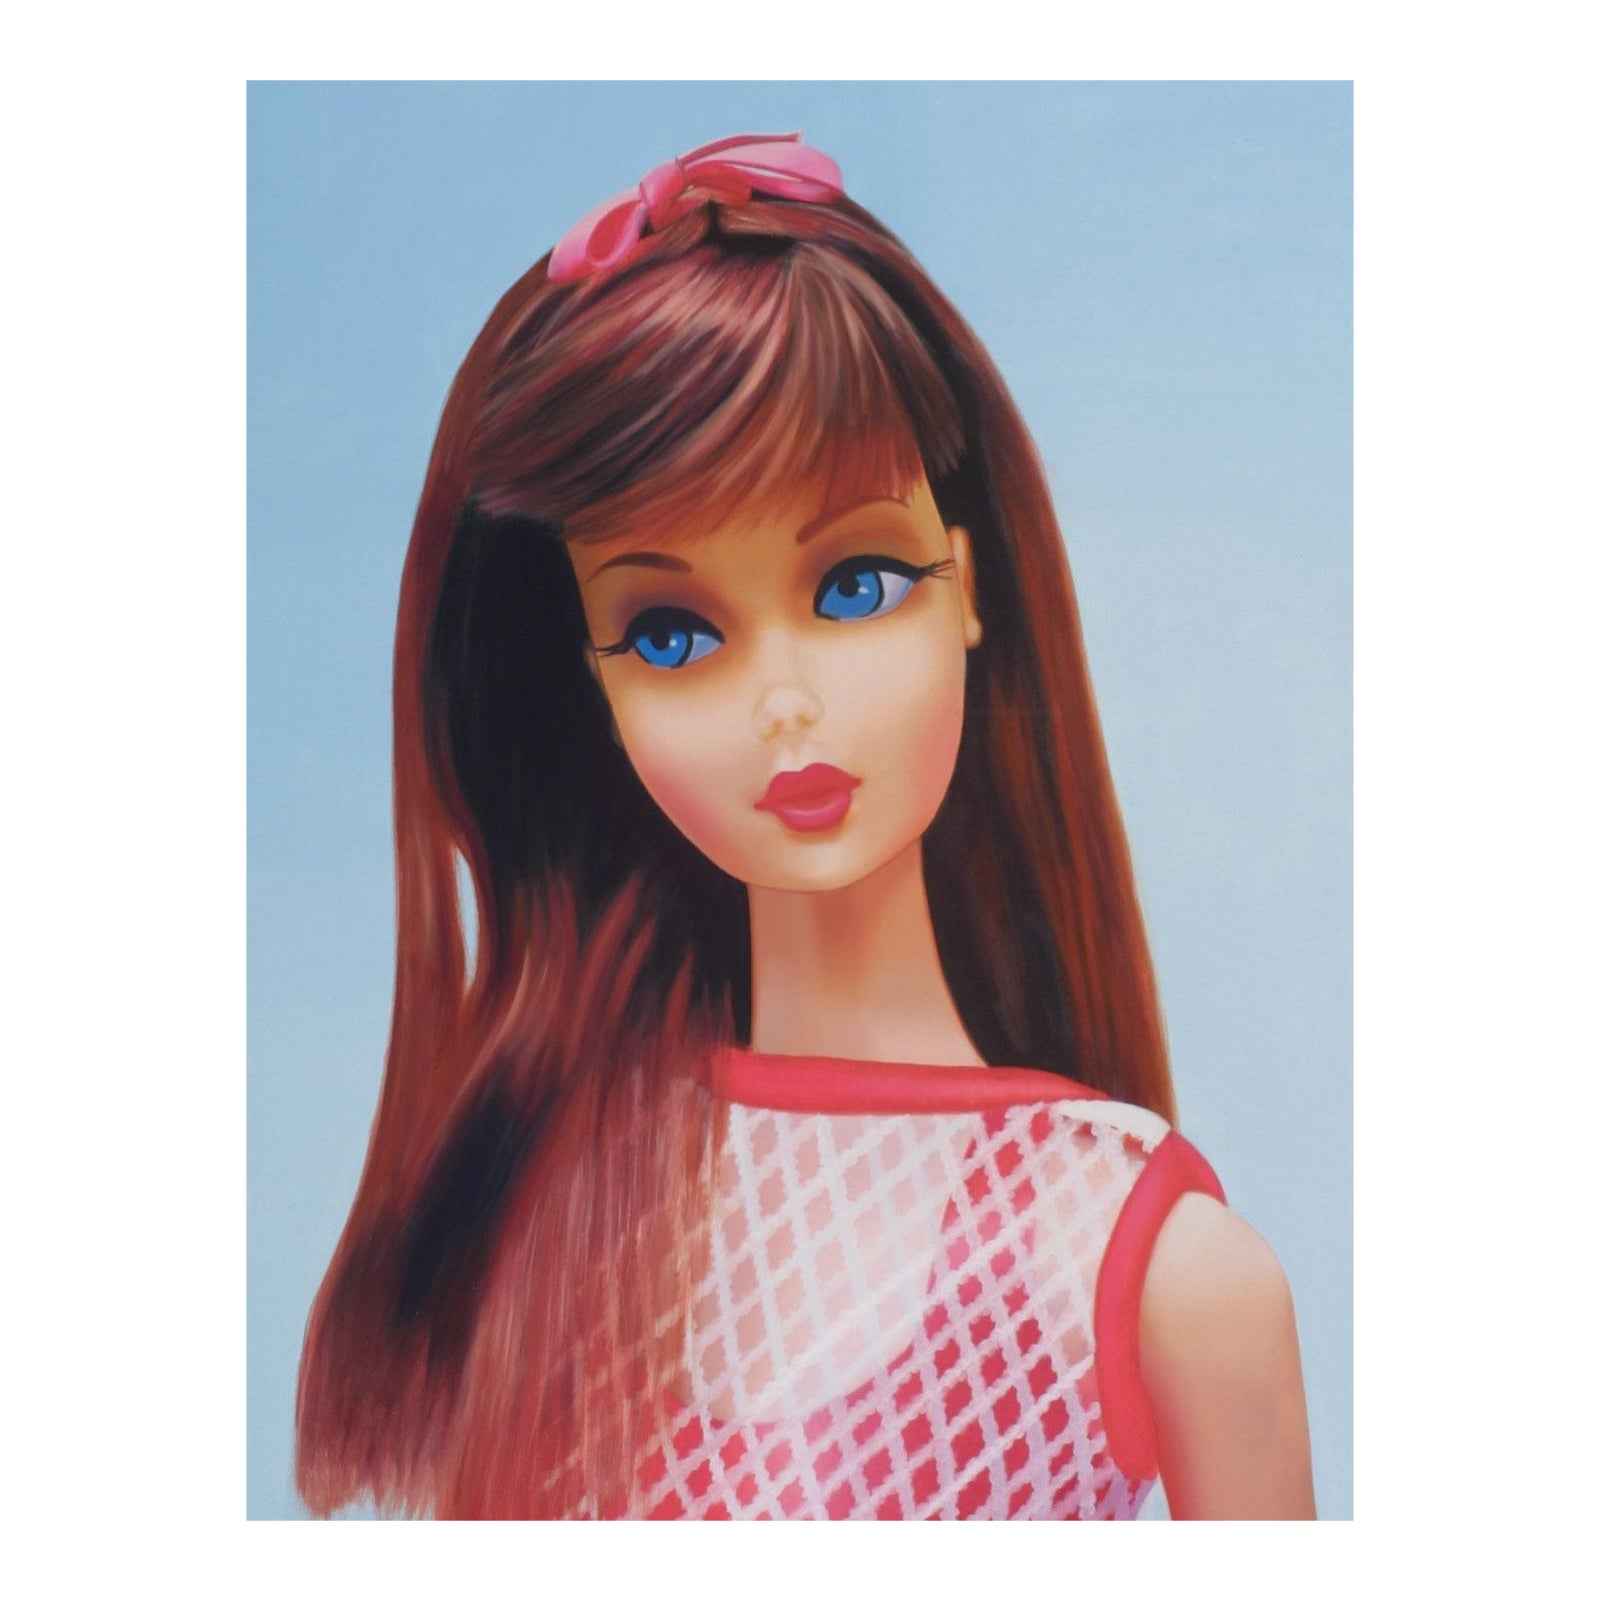 Quot Twist N Turn Quot Barbie Oil Painting Chairish